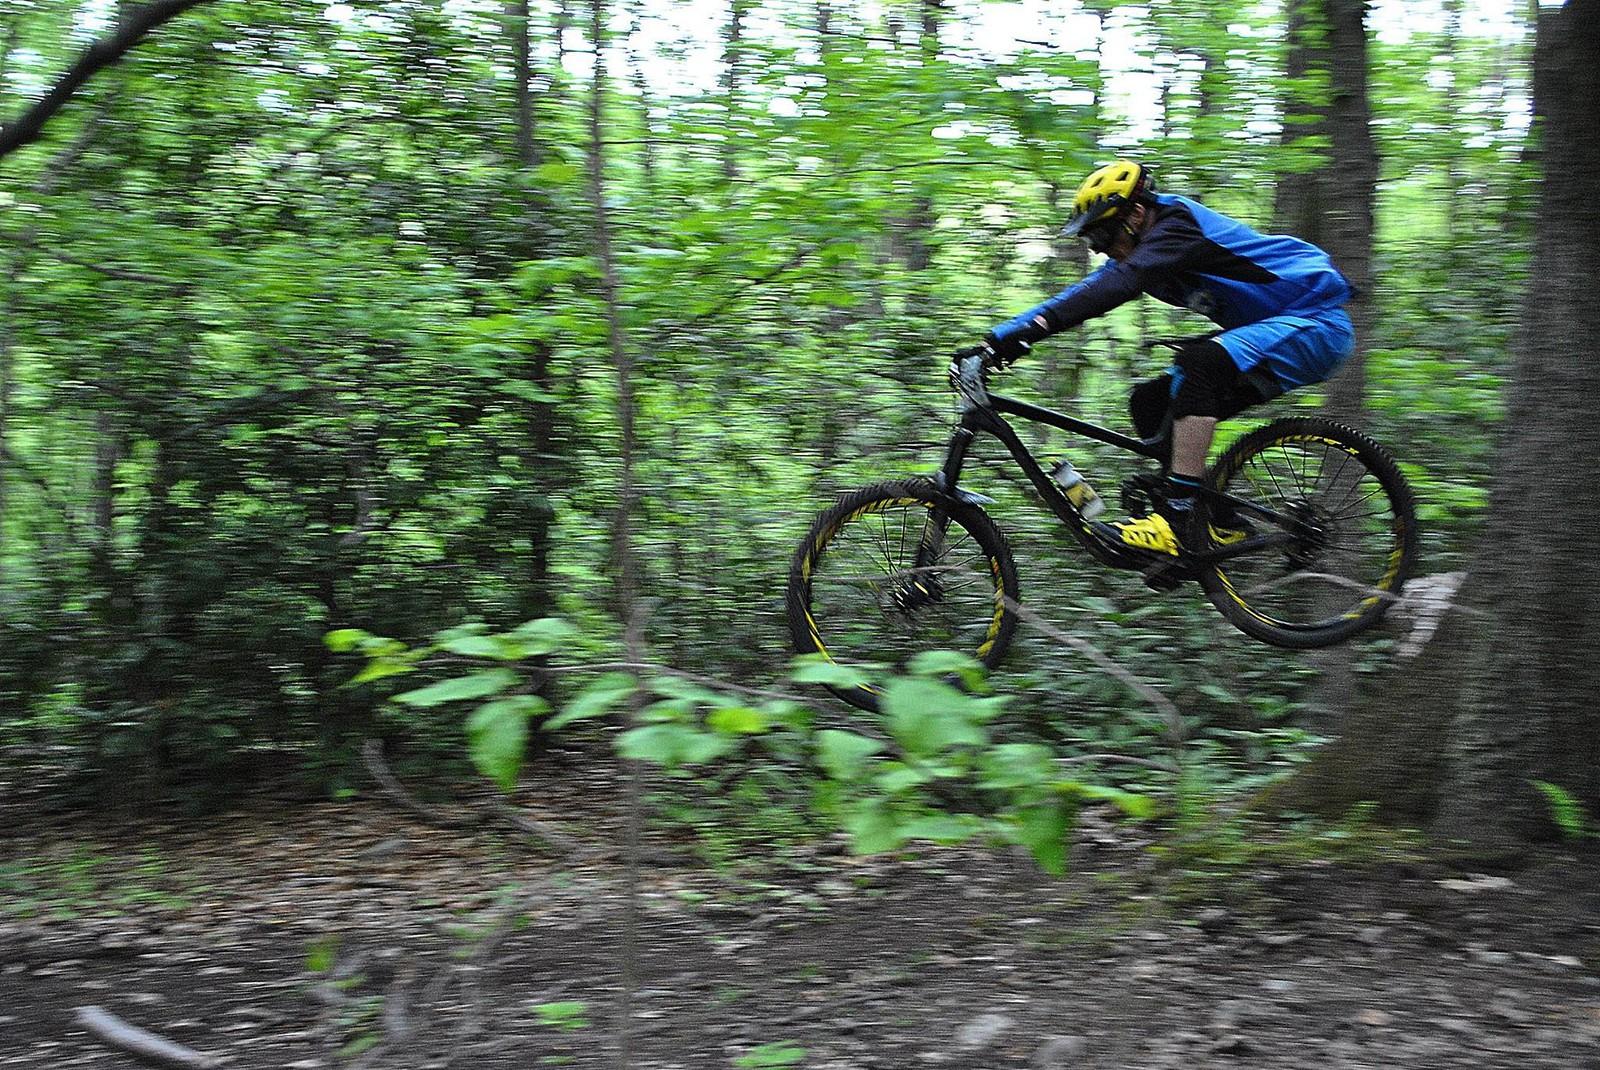 V-Notch Drop S2 - gerrycreighton - Mountain Biking Pictures - Vital MTB